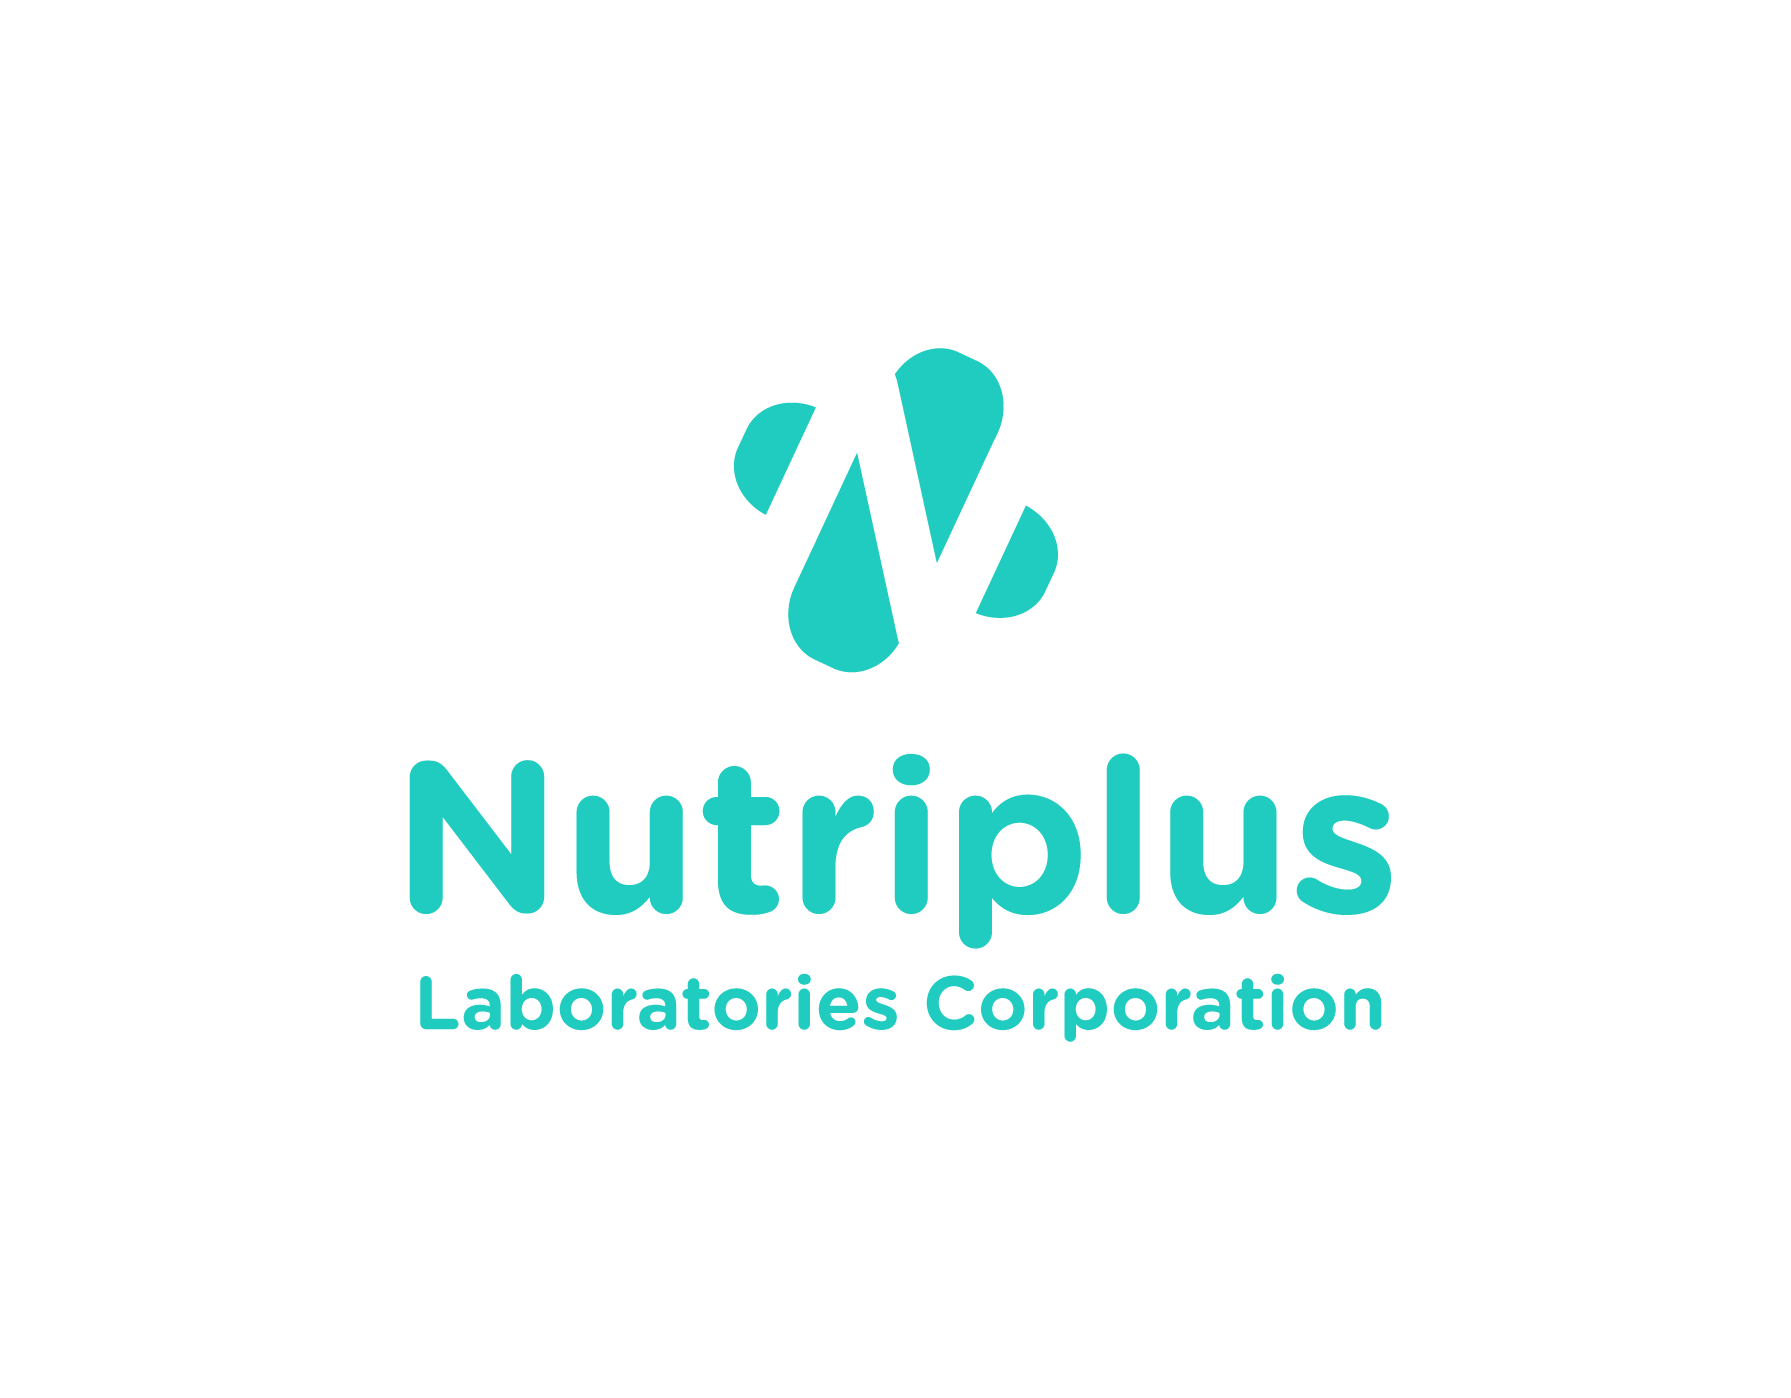 Nutriplus Laboratories Corporation